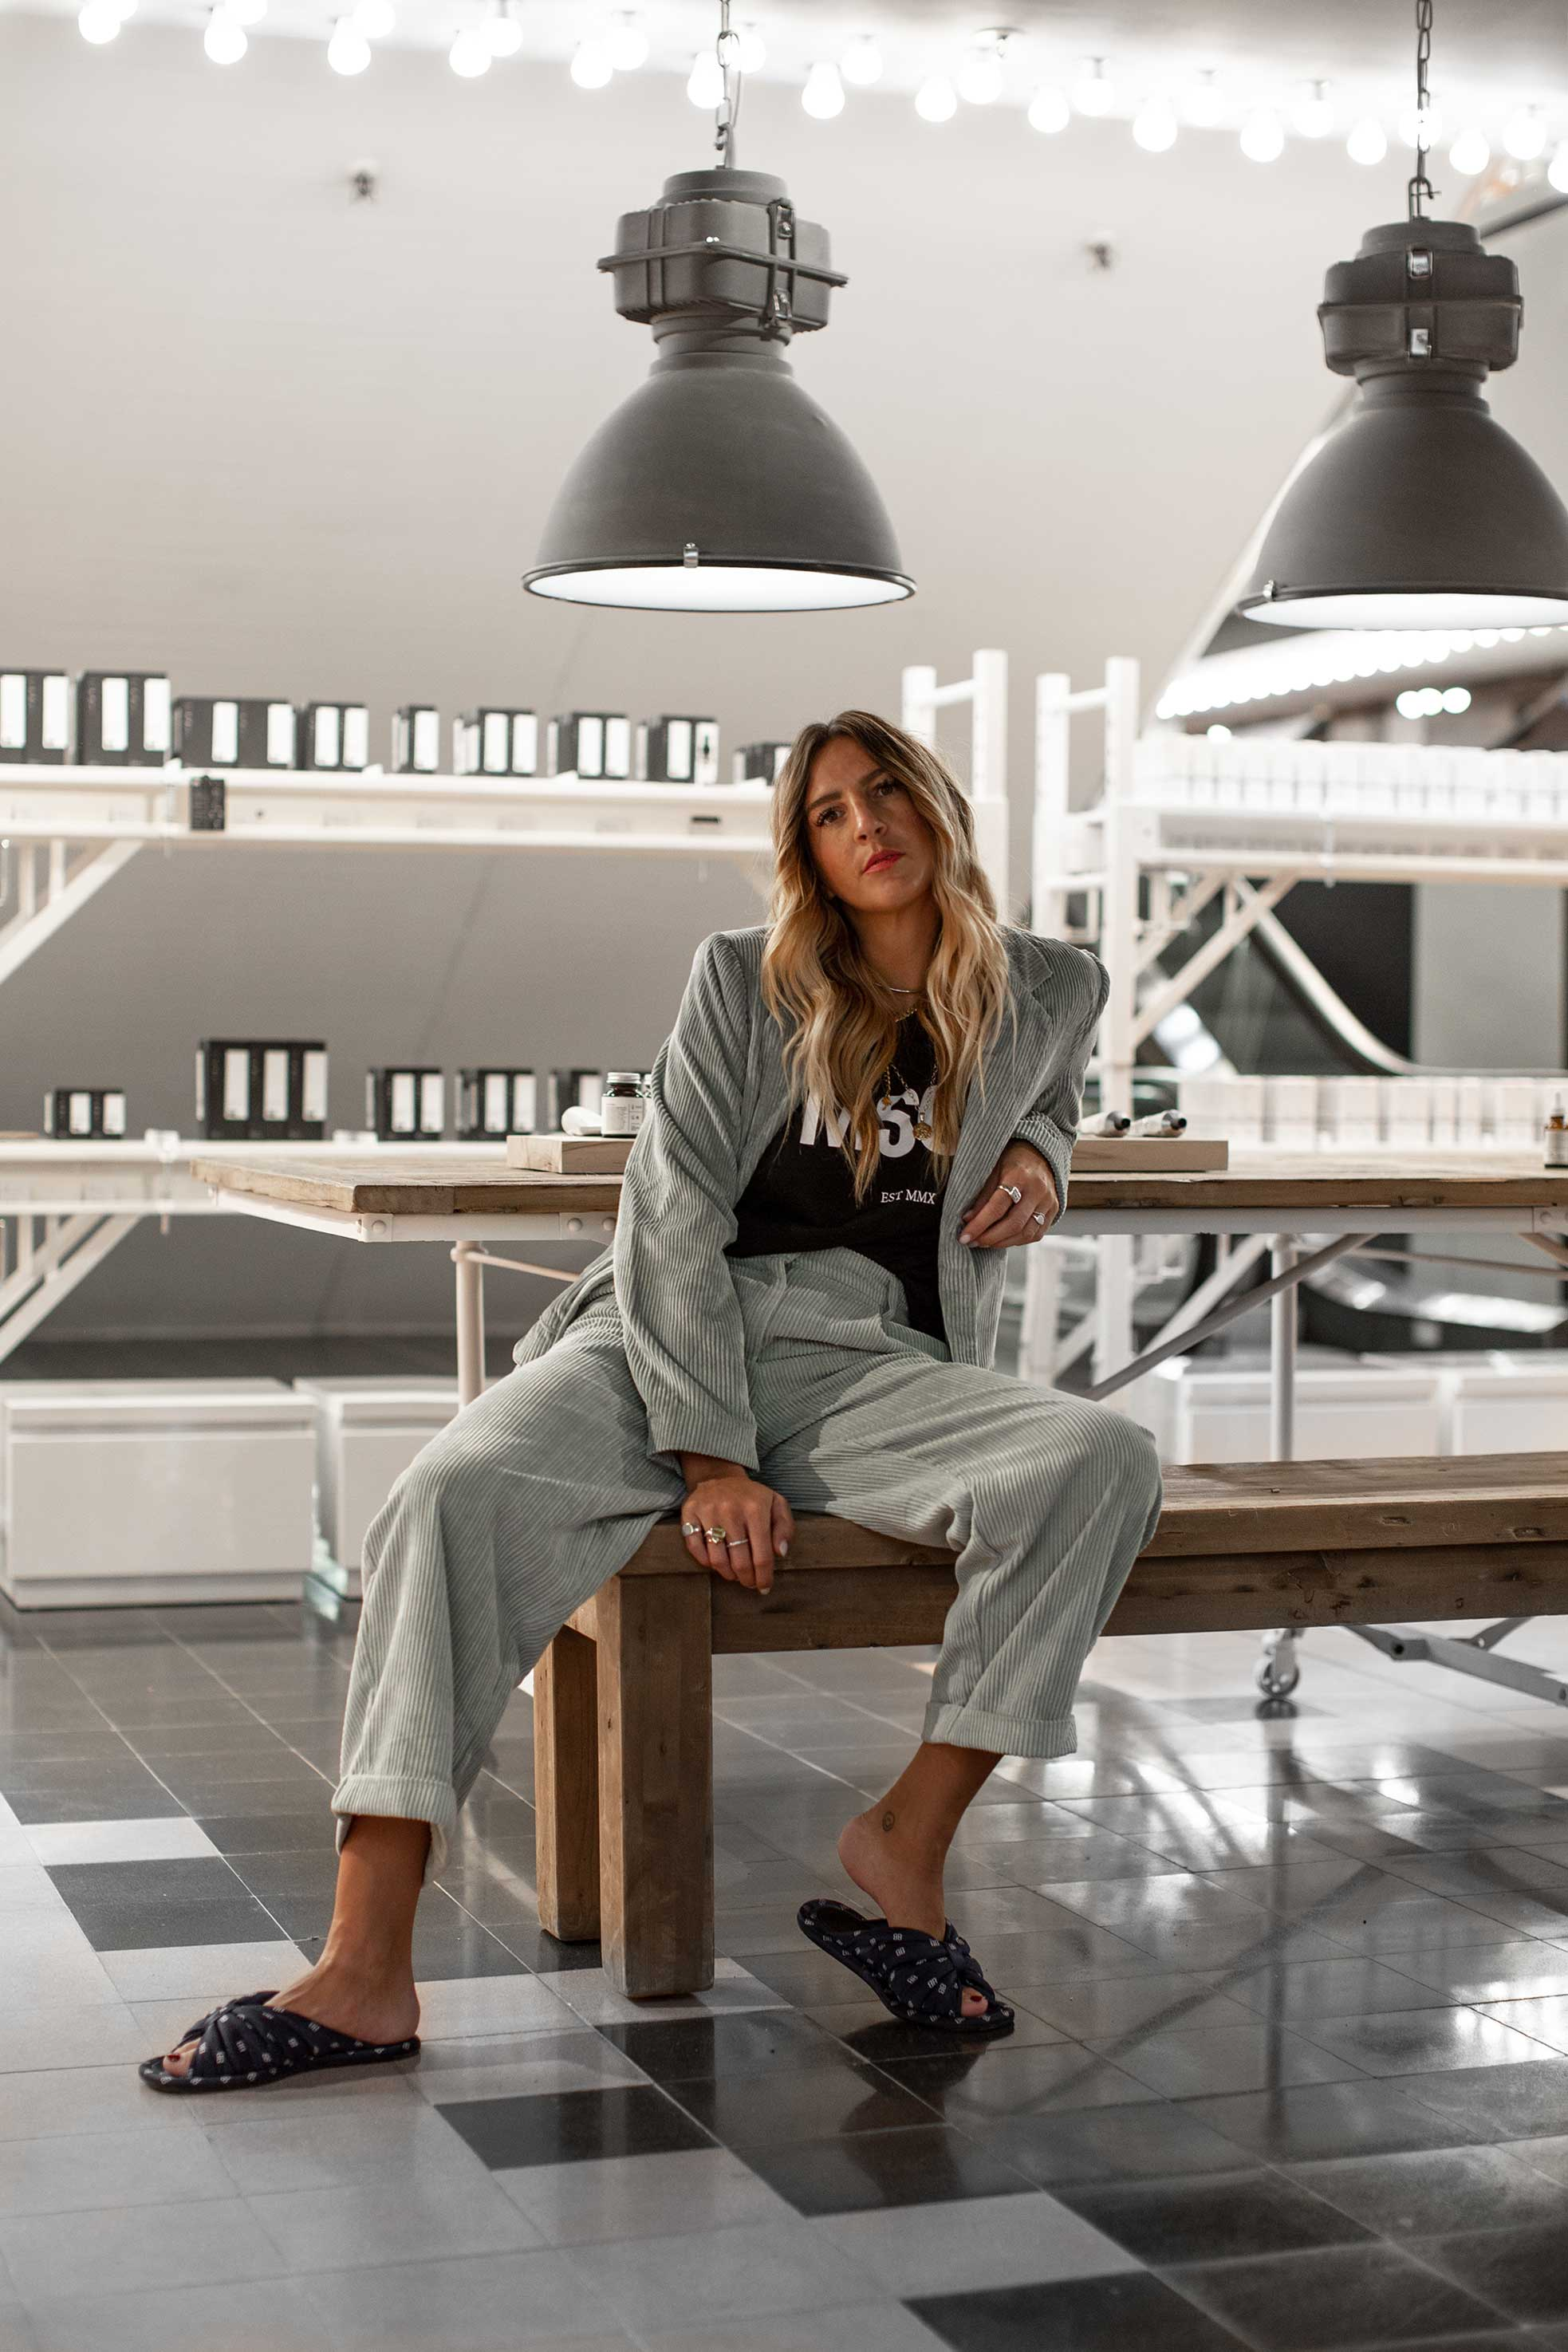 black-palms-the-storey-konzeptstore-im-oberpollinger-mu%cc%88nchen-urban-streetwear-5